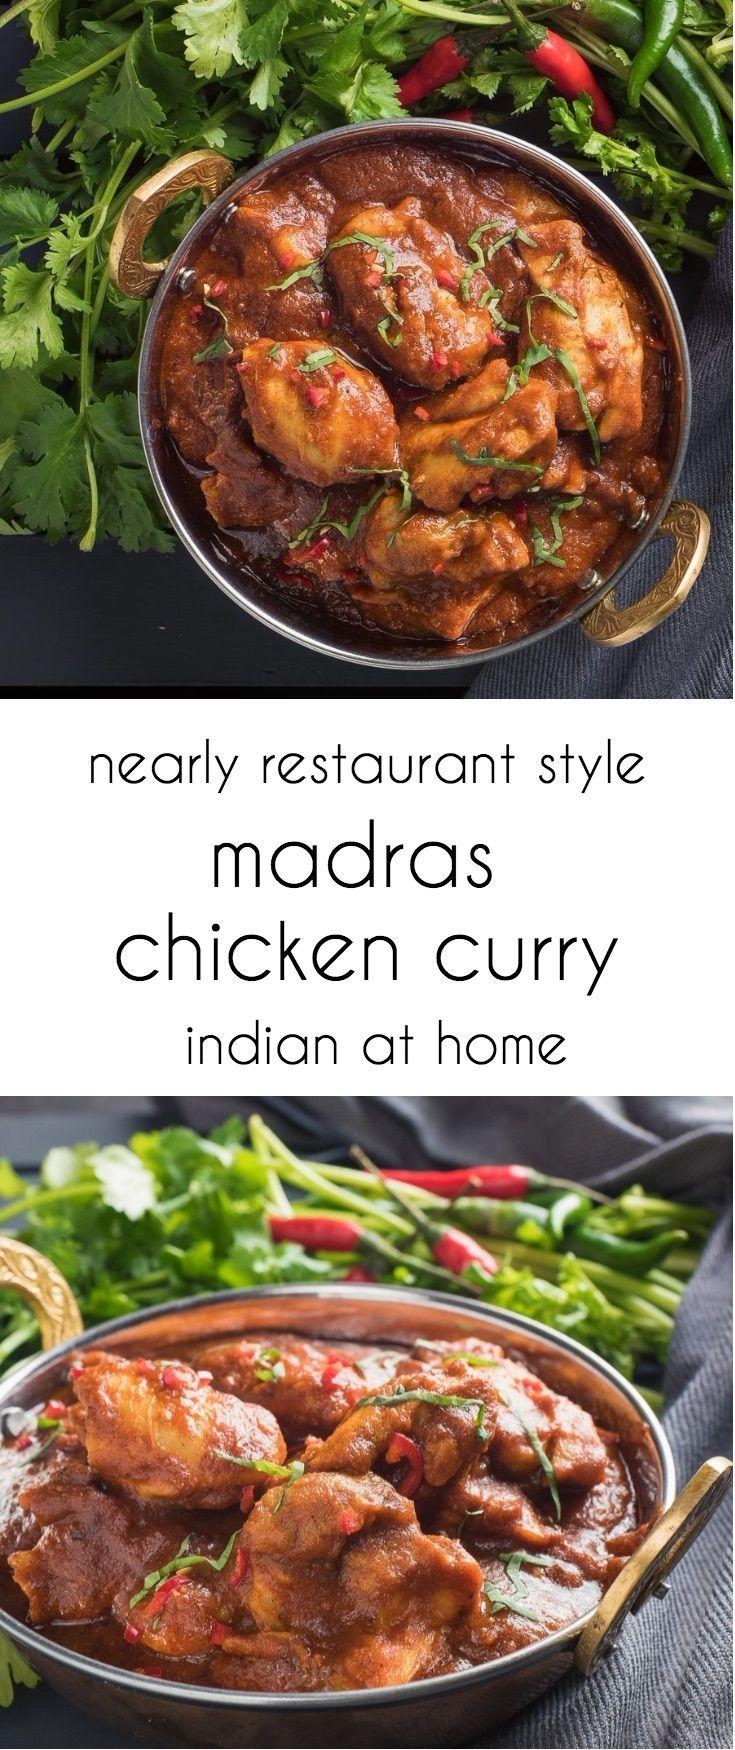 nearly restaurant style chicken madras recipe chicken madras indian food recipes curry recipes nearly restaurant style chicken madras recipe chicken madras indian food recipes curry recipes